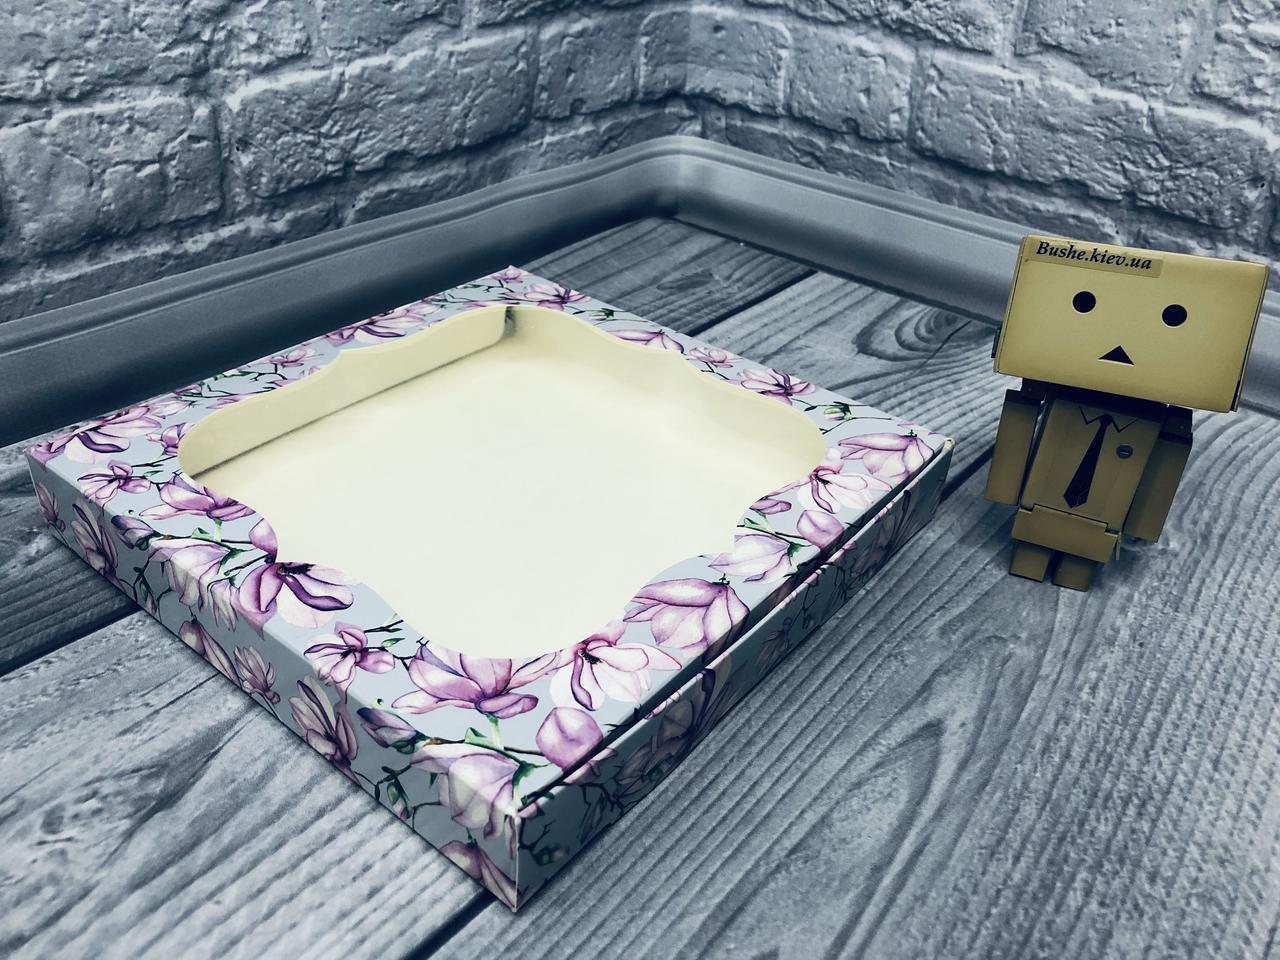 *10 шт* / Коробка для пряников / 200х200х30 мм / печать-Магнол / окно-обычн / лк / цв